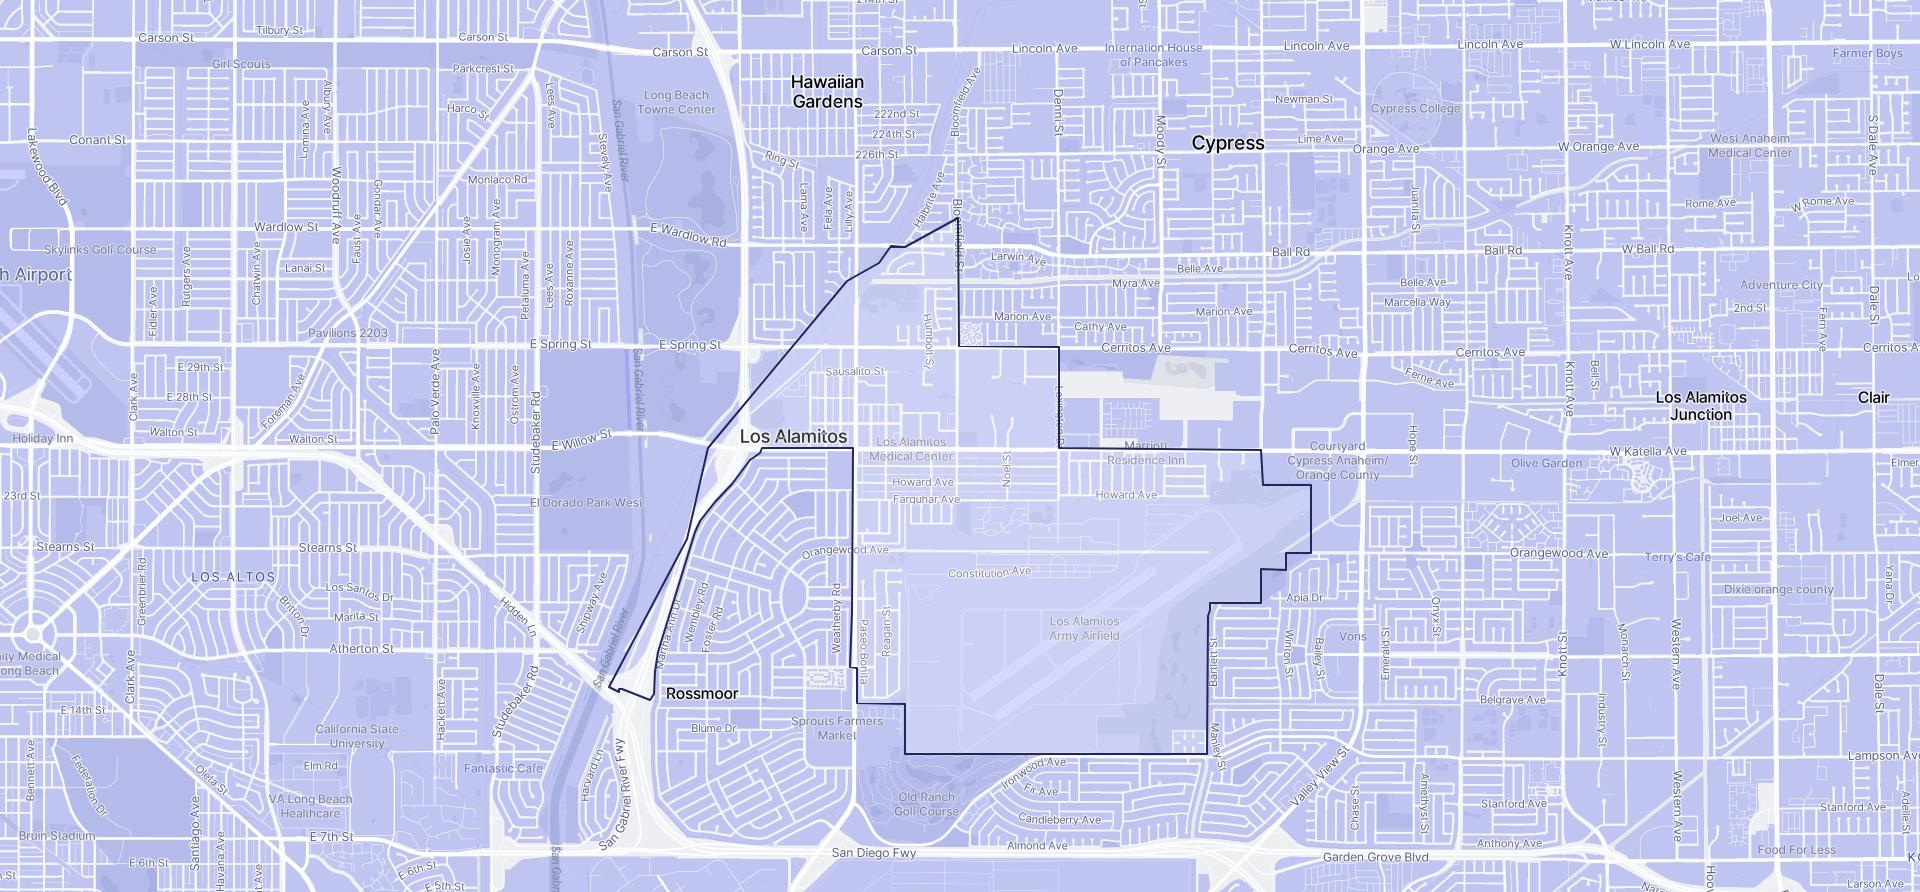 Image of Los Alamitos boundaries on a map.